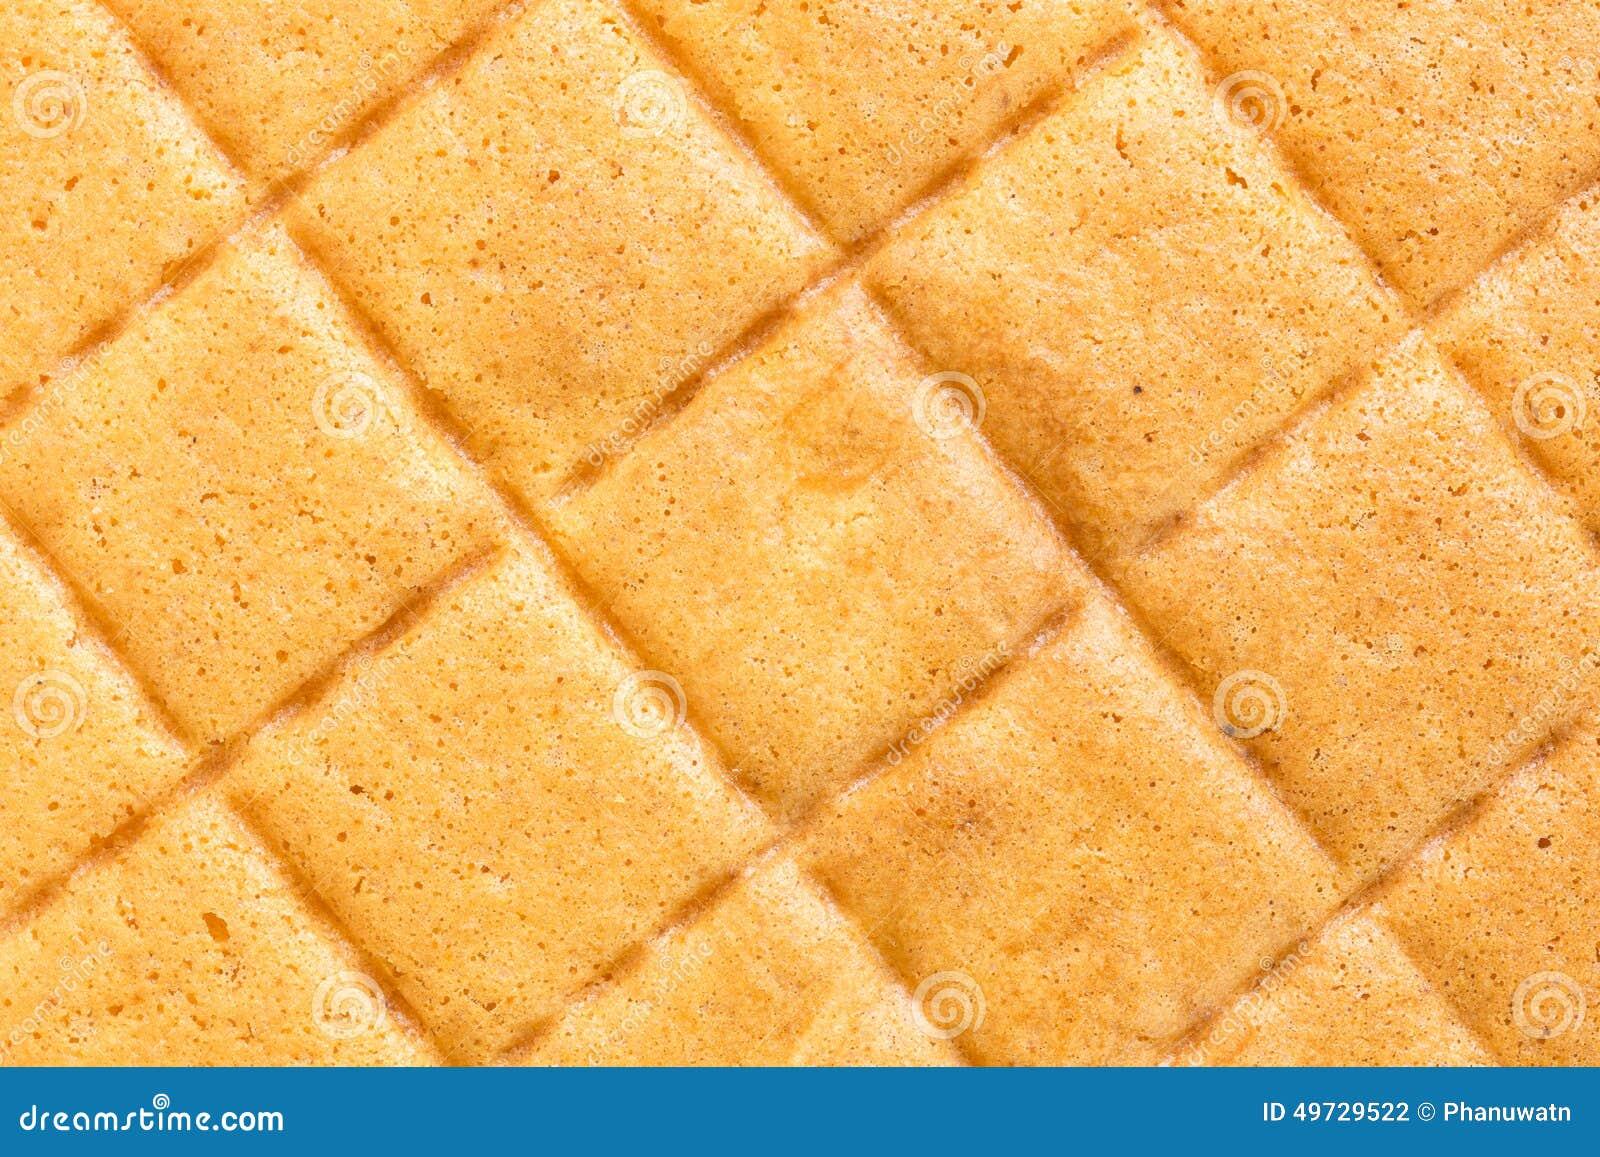 Chocolate Sponge Cake Texture